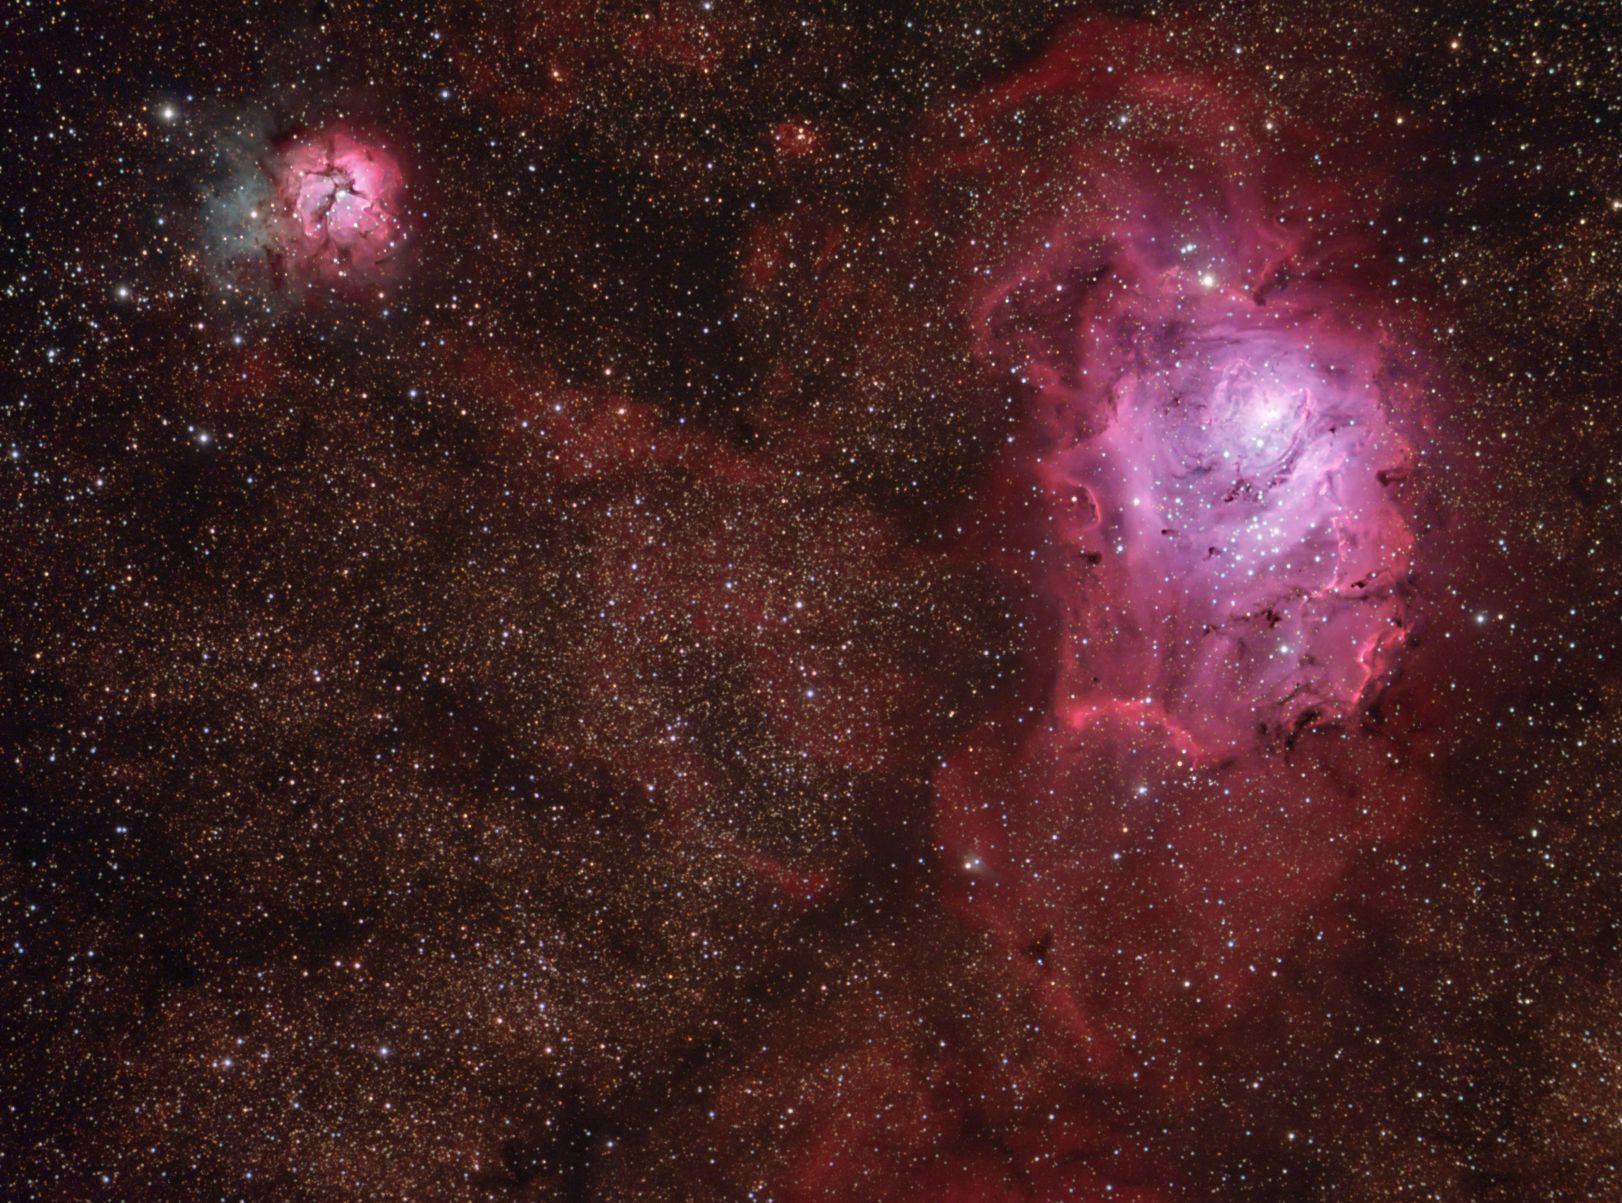 lagoon trifid nebula - photo #14